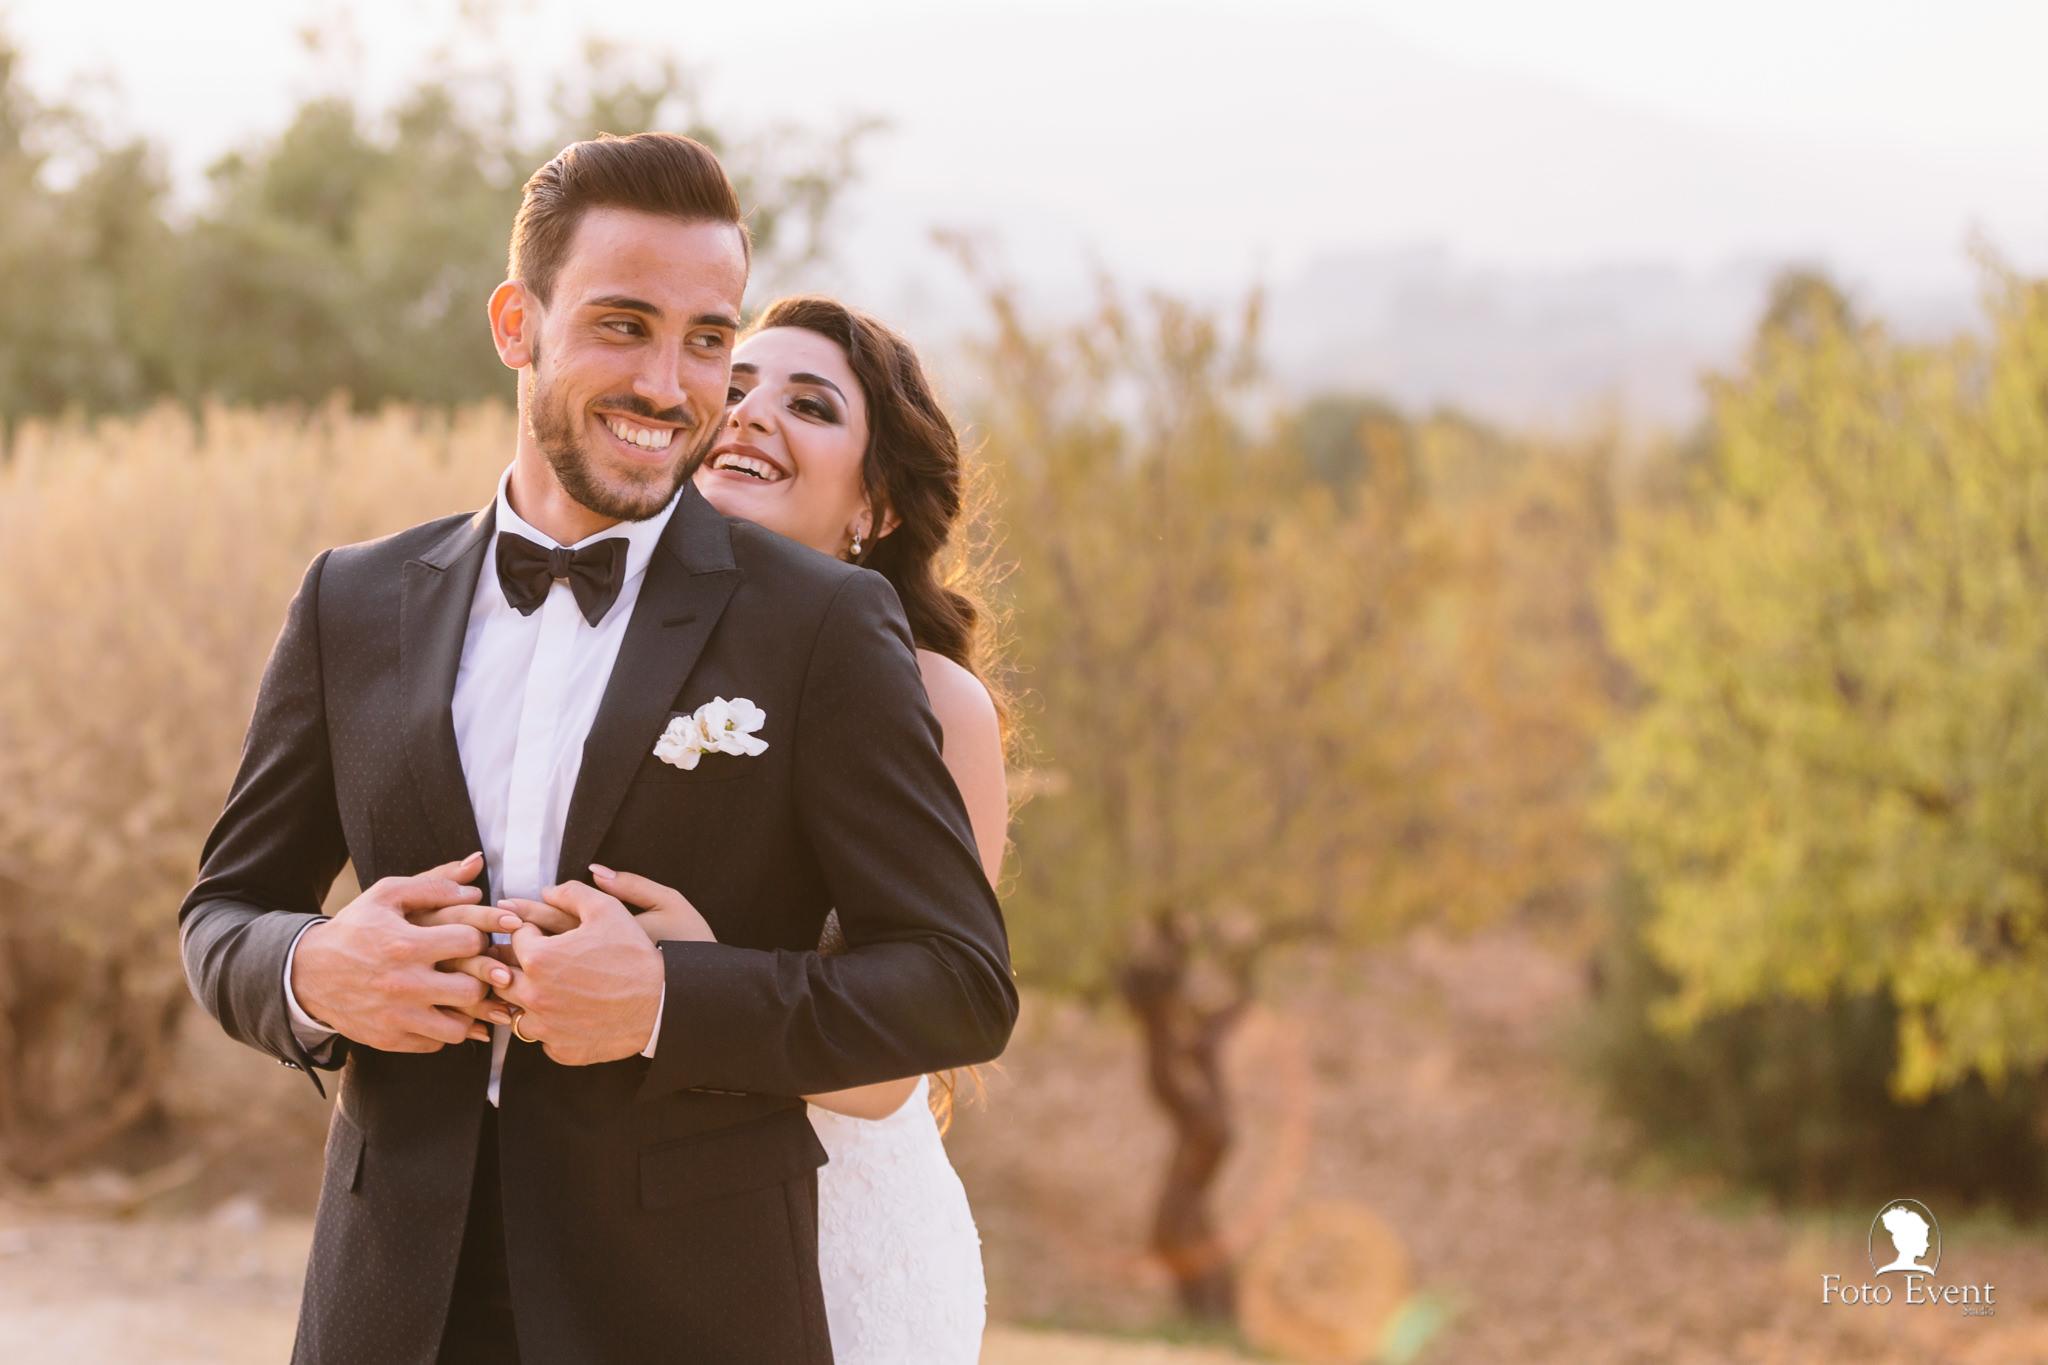 039-2019-08-31-Matrimonio-Serena-e-Saverio-Tarantino-zoom-410